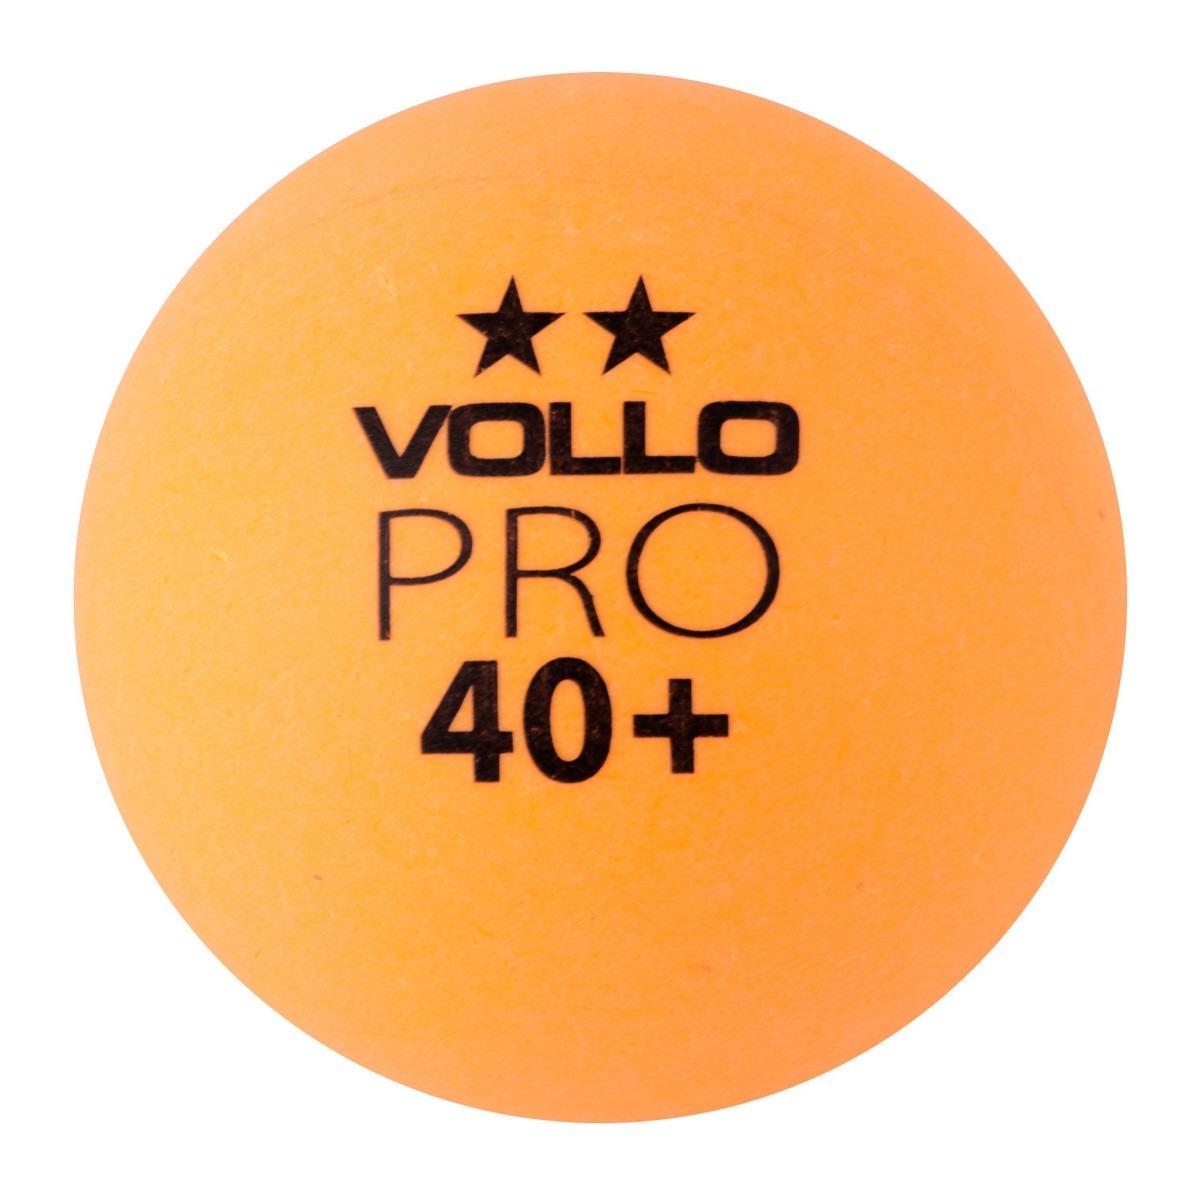 c8597d12f05fa bola tênis mesa vollo vt608 com 36 unidades 2 estrelas. Carregando zoom.